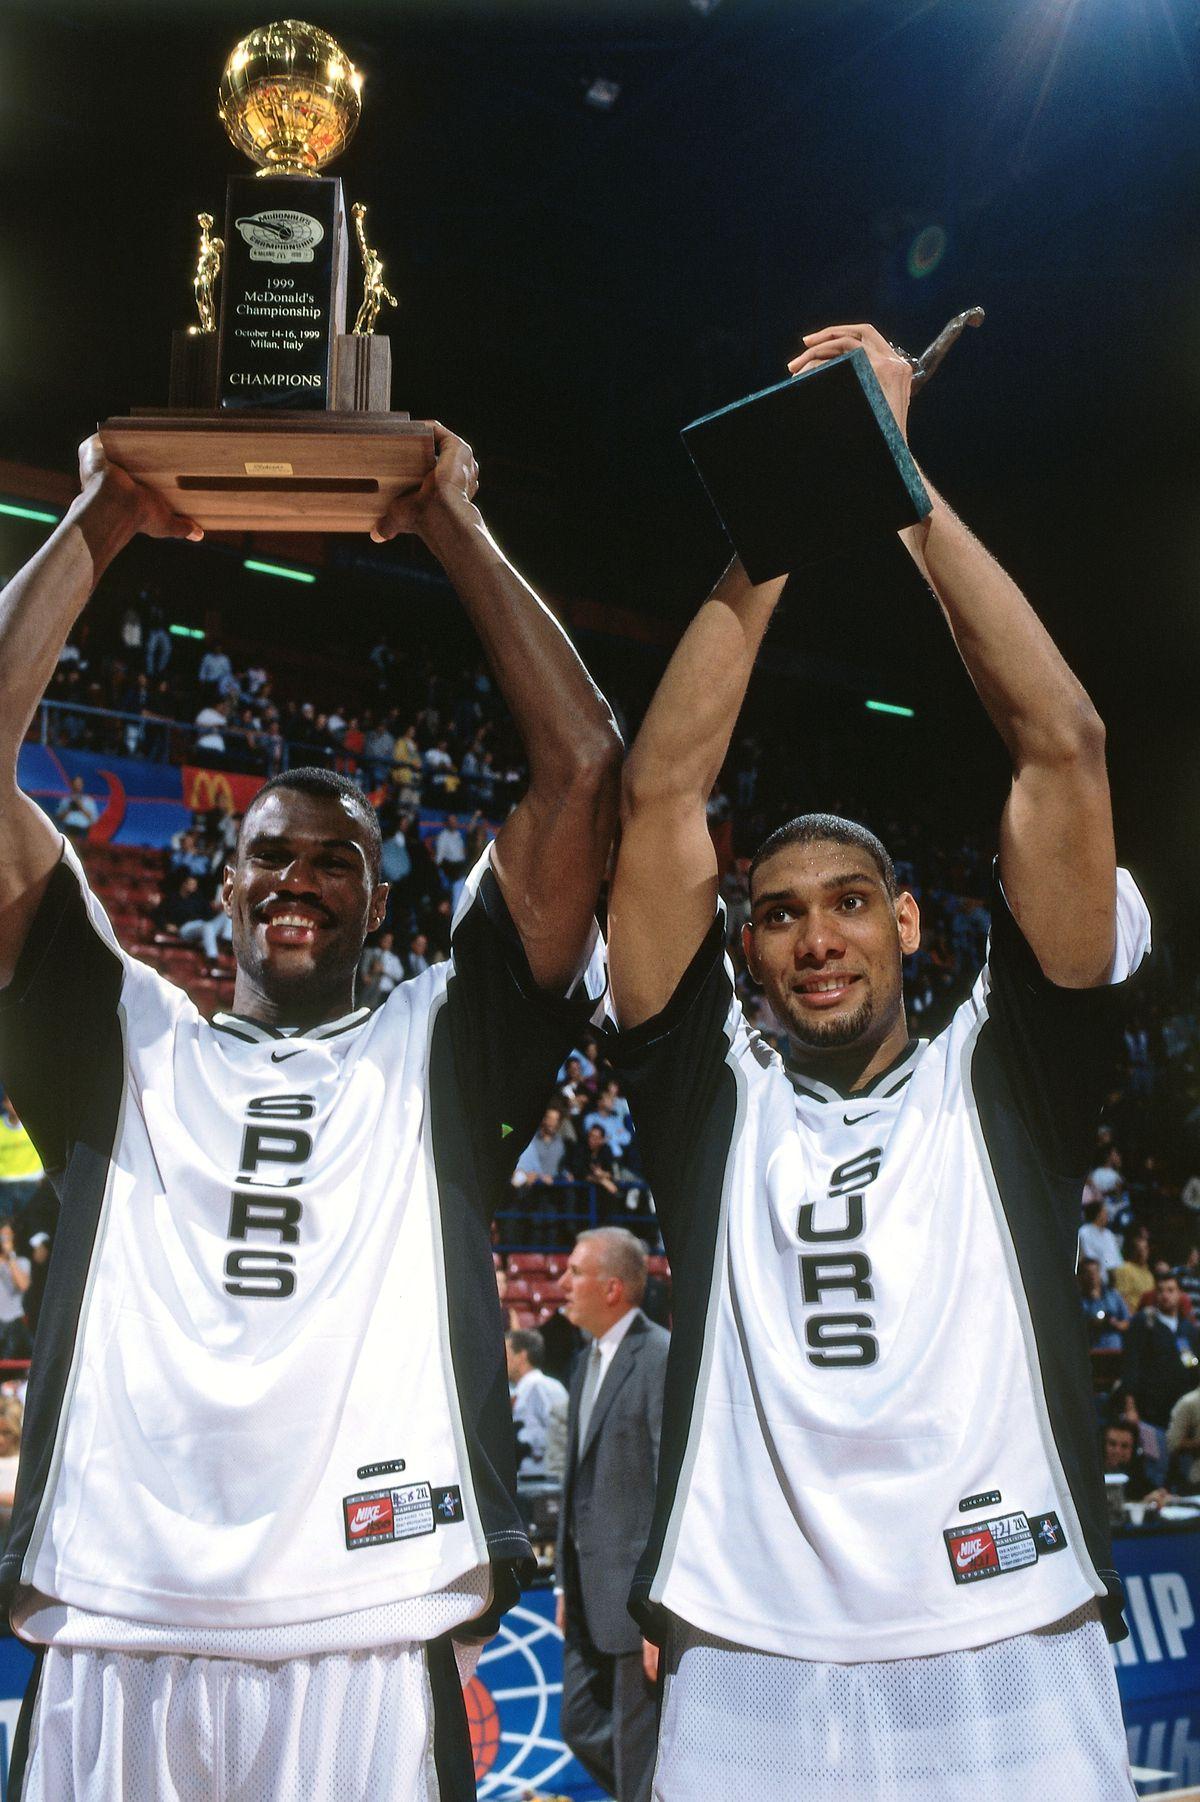 1999 McDonalds Open: Vasco Da Gama v San Antonio Spurs